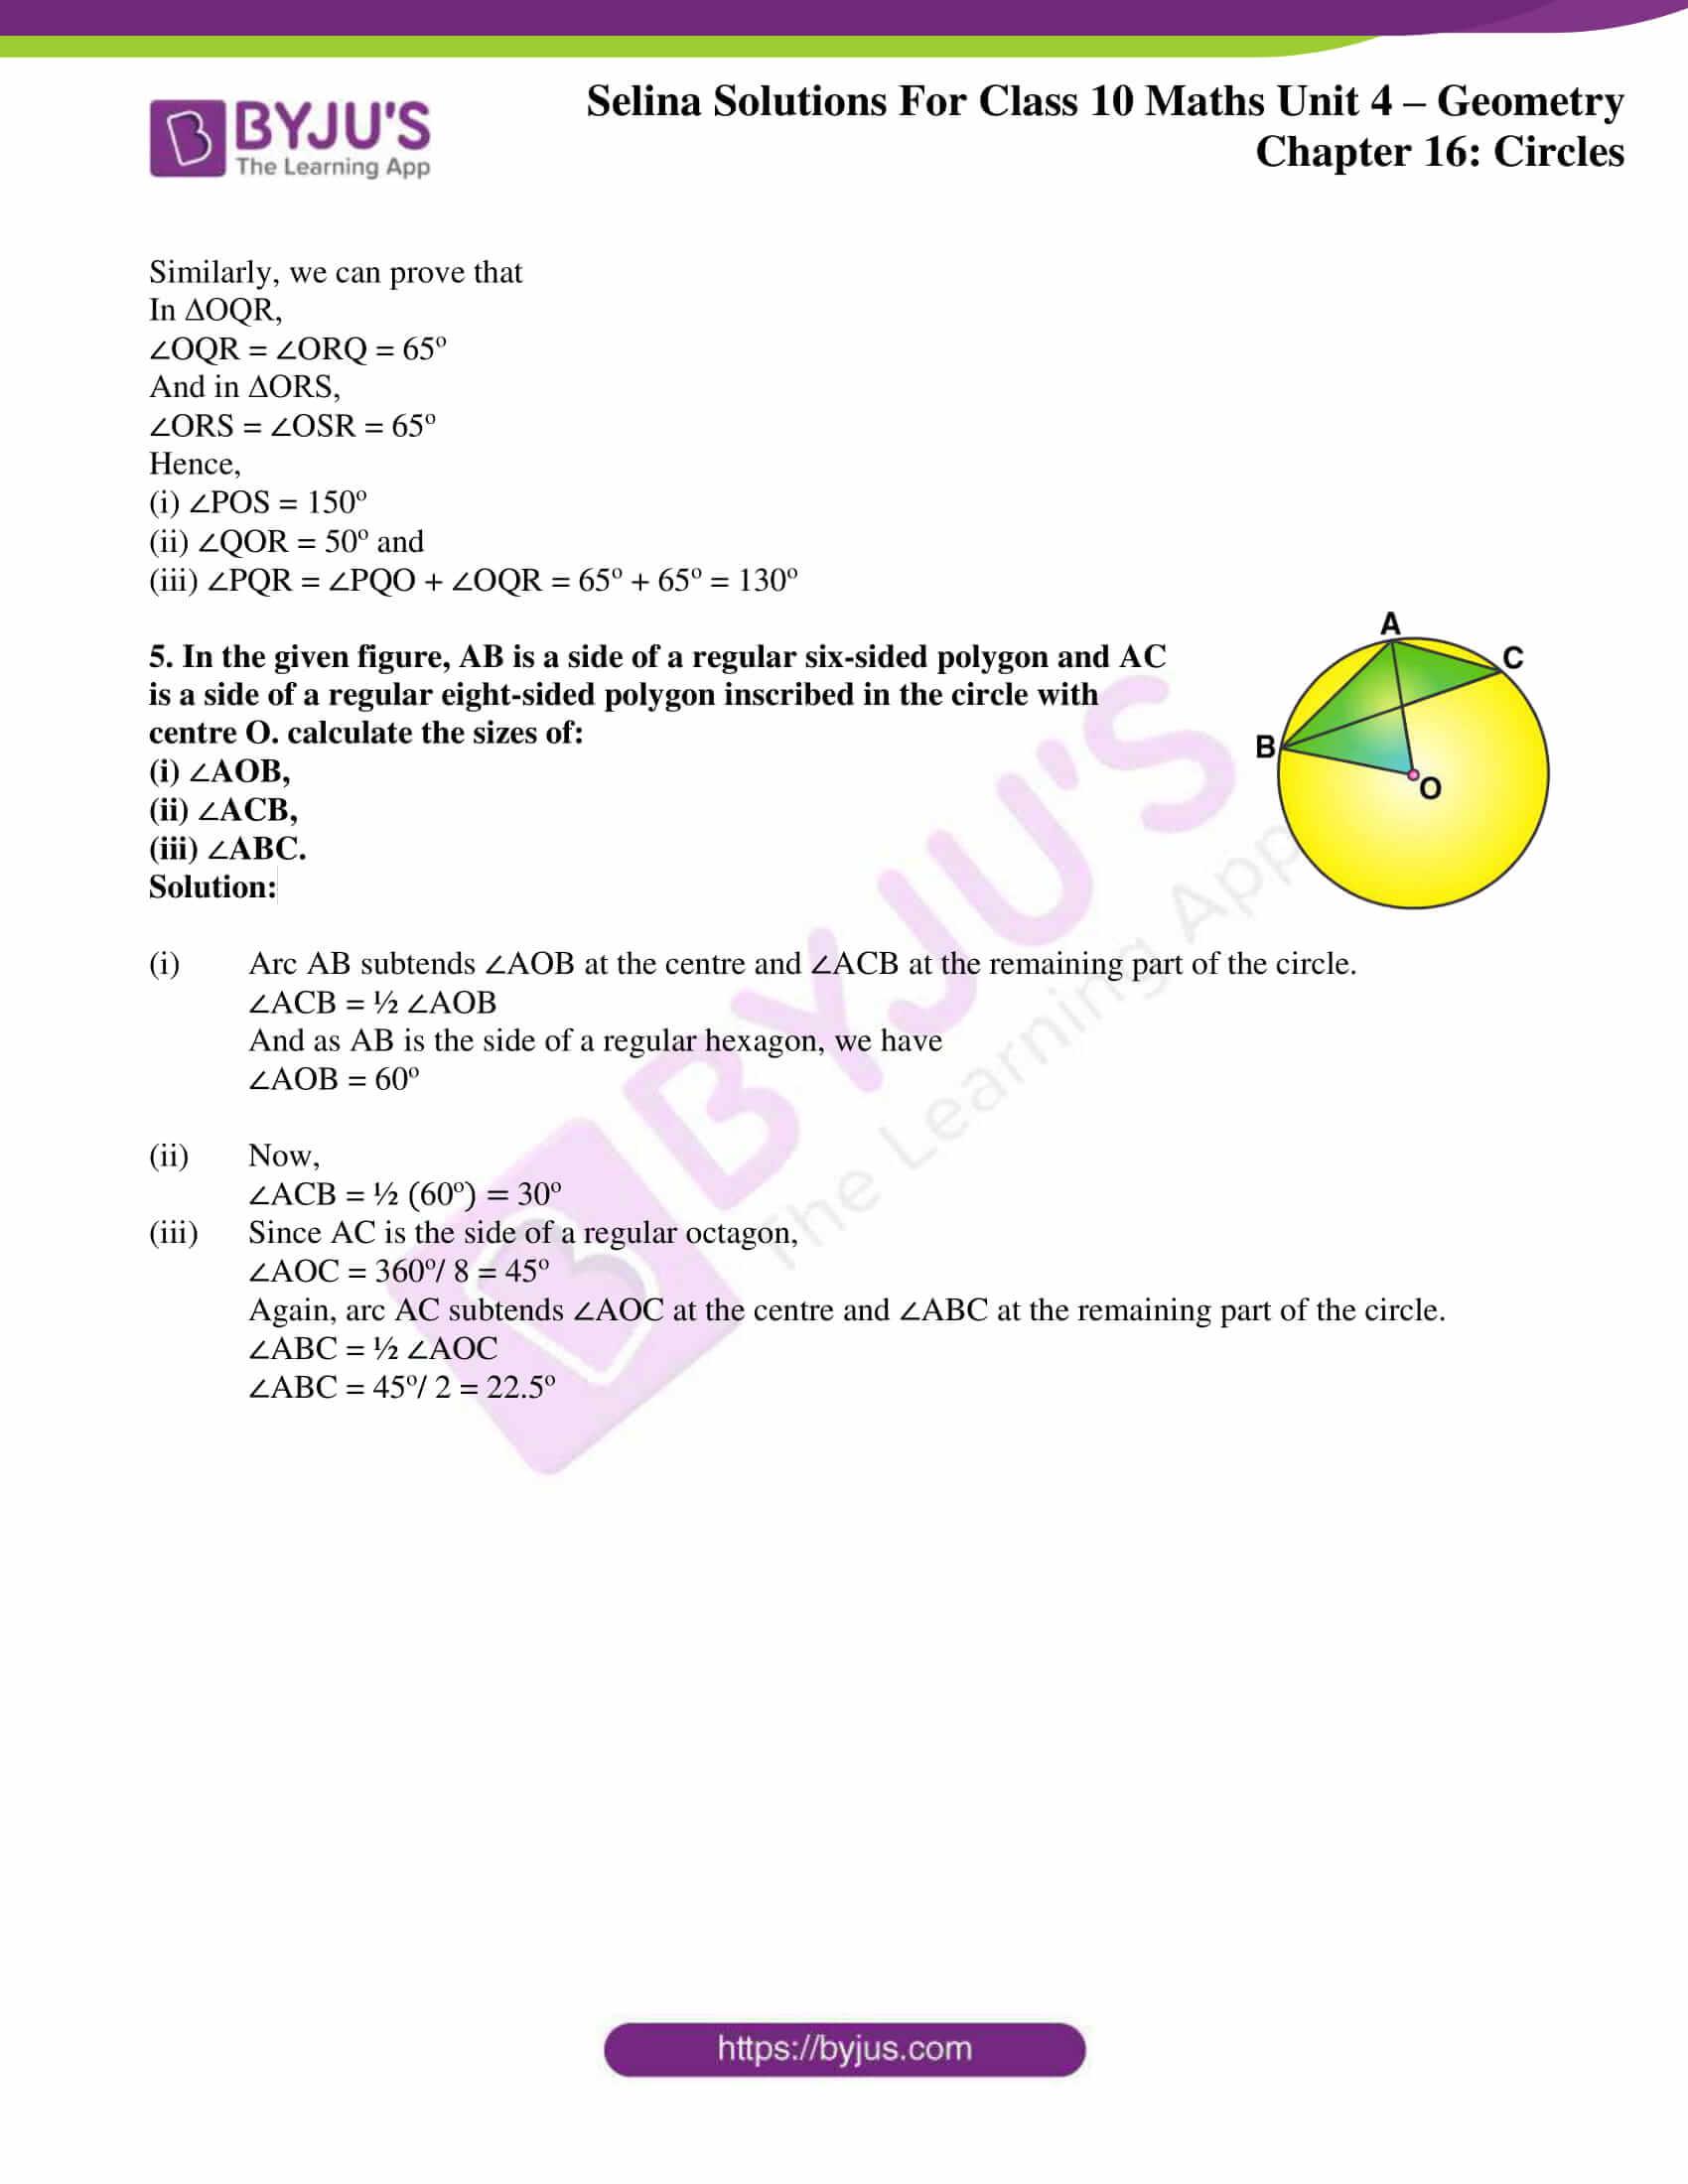 selina-sol-maths-class-10-ch-17-ex-b-4